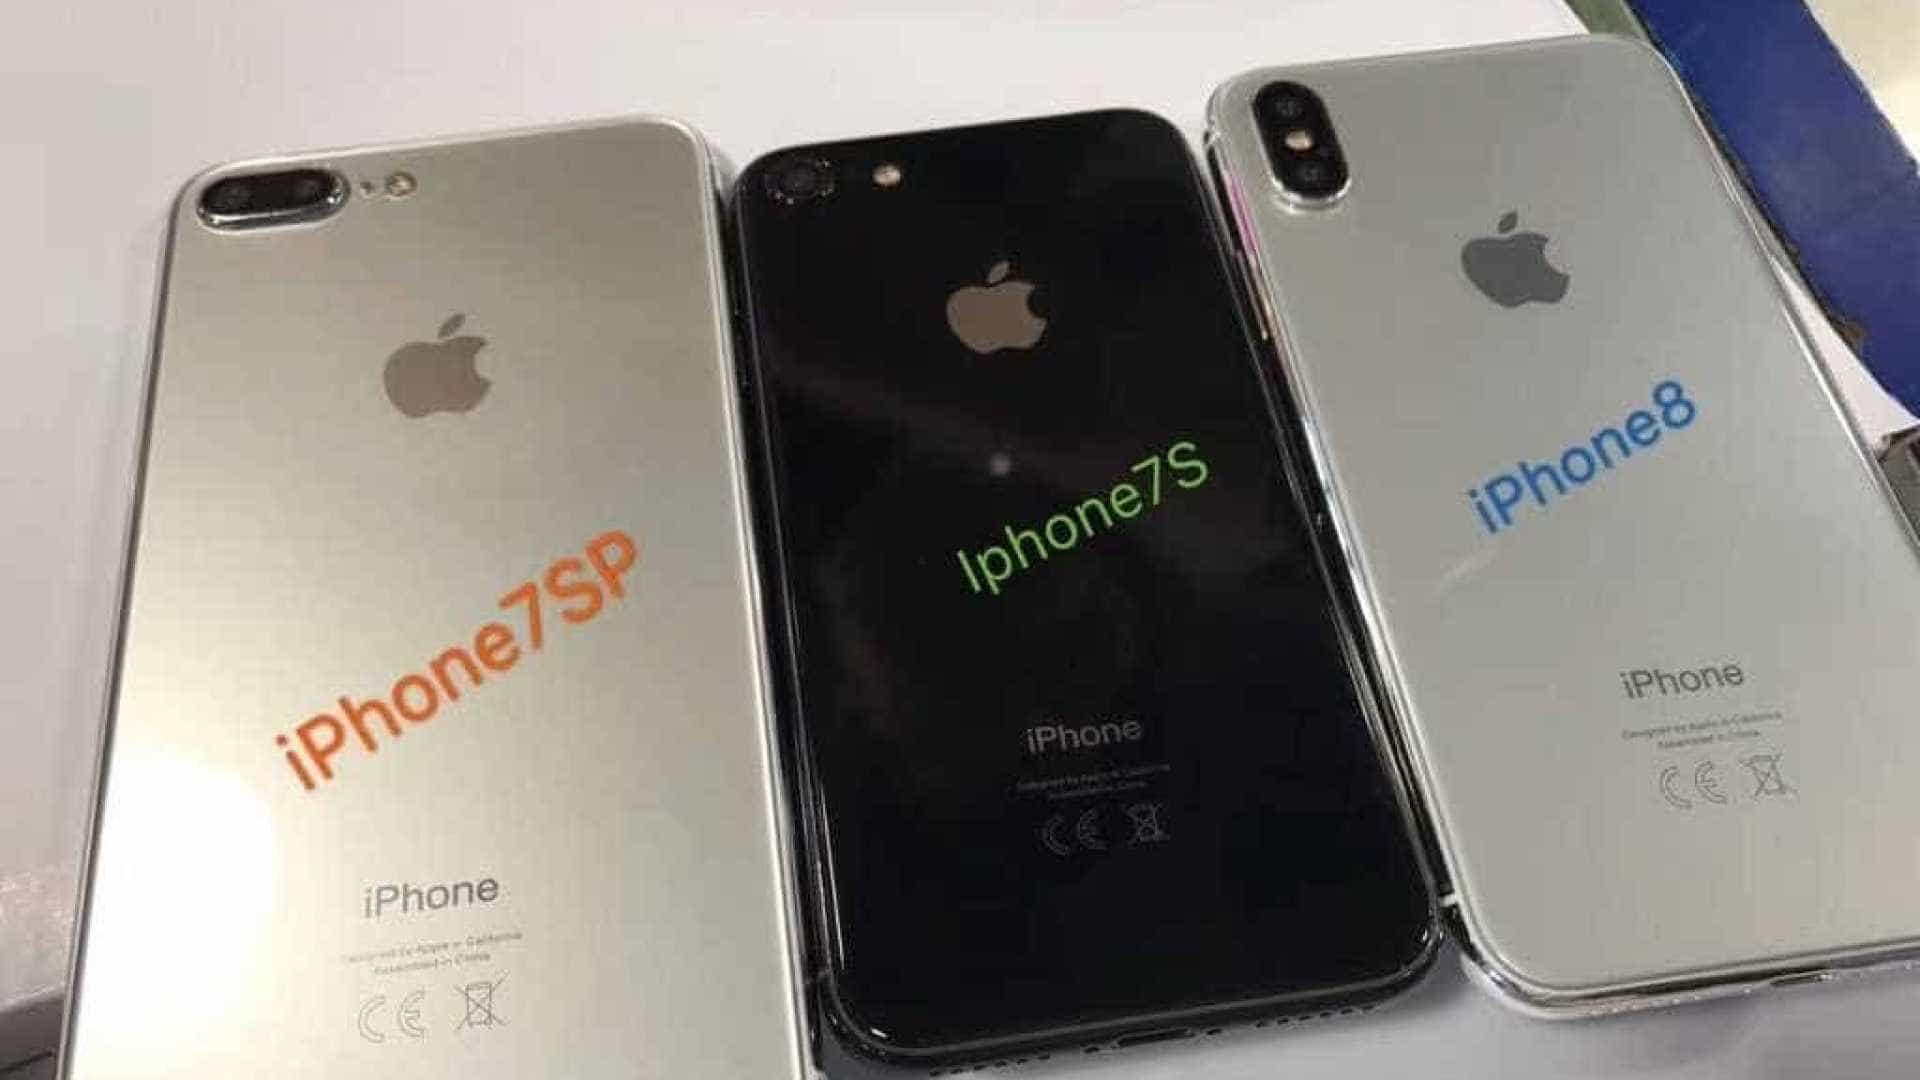 Imagens do novo iPhone 7S Plus vazam na web — Rumor